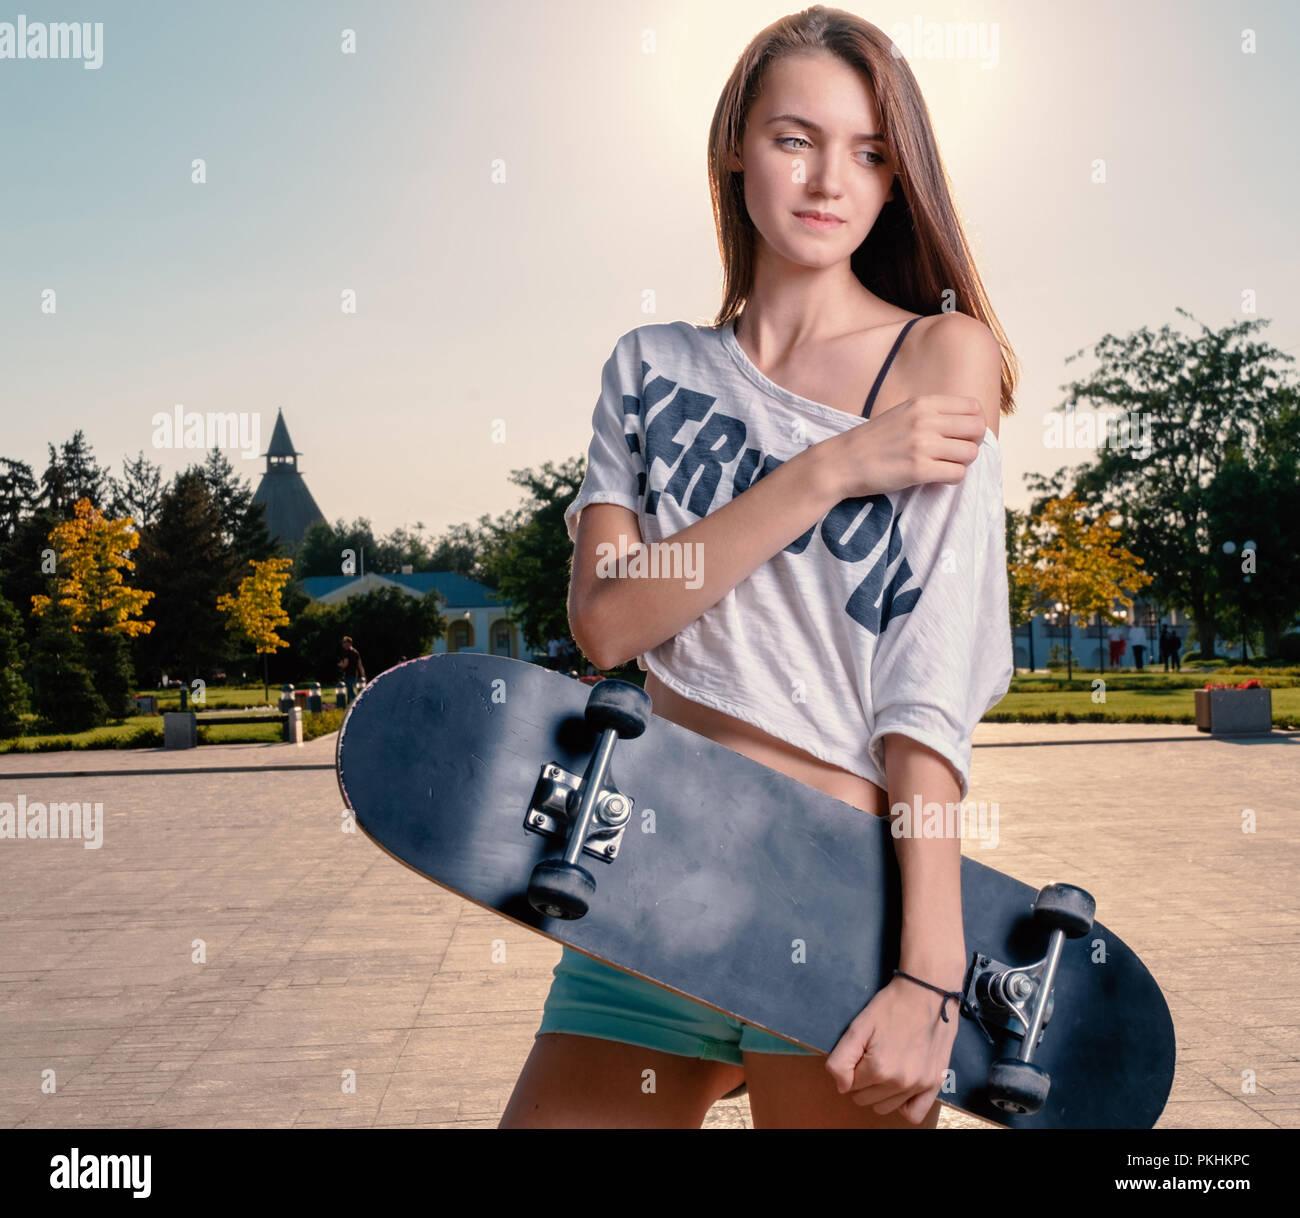 Long haired girl holding skateboard posing with bare shoulder - Stock Image